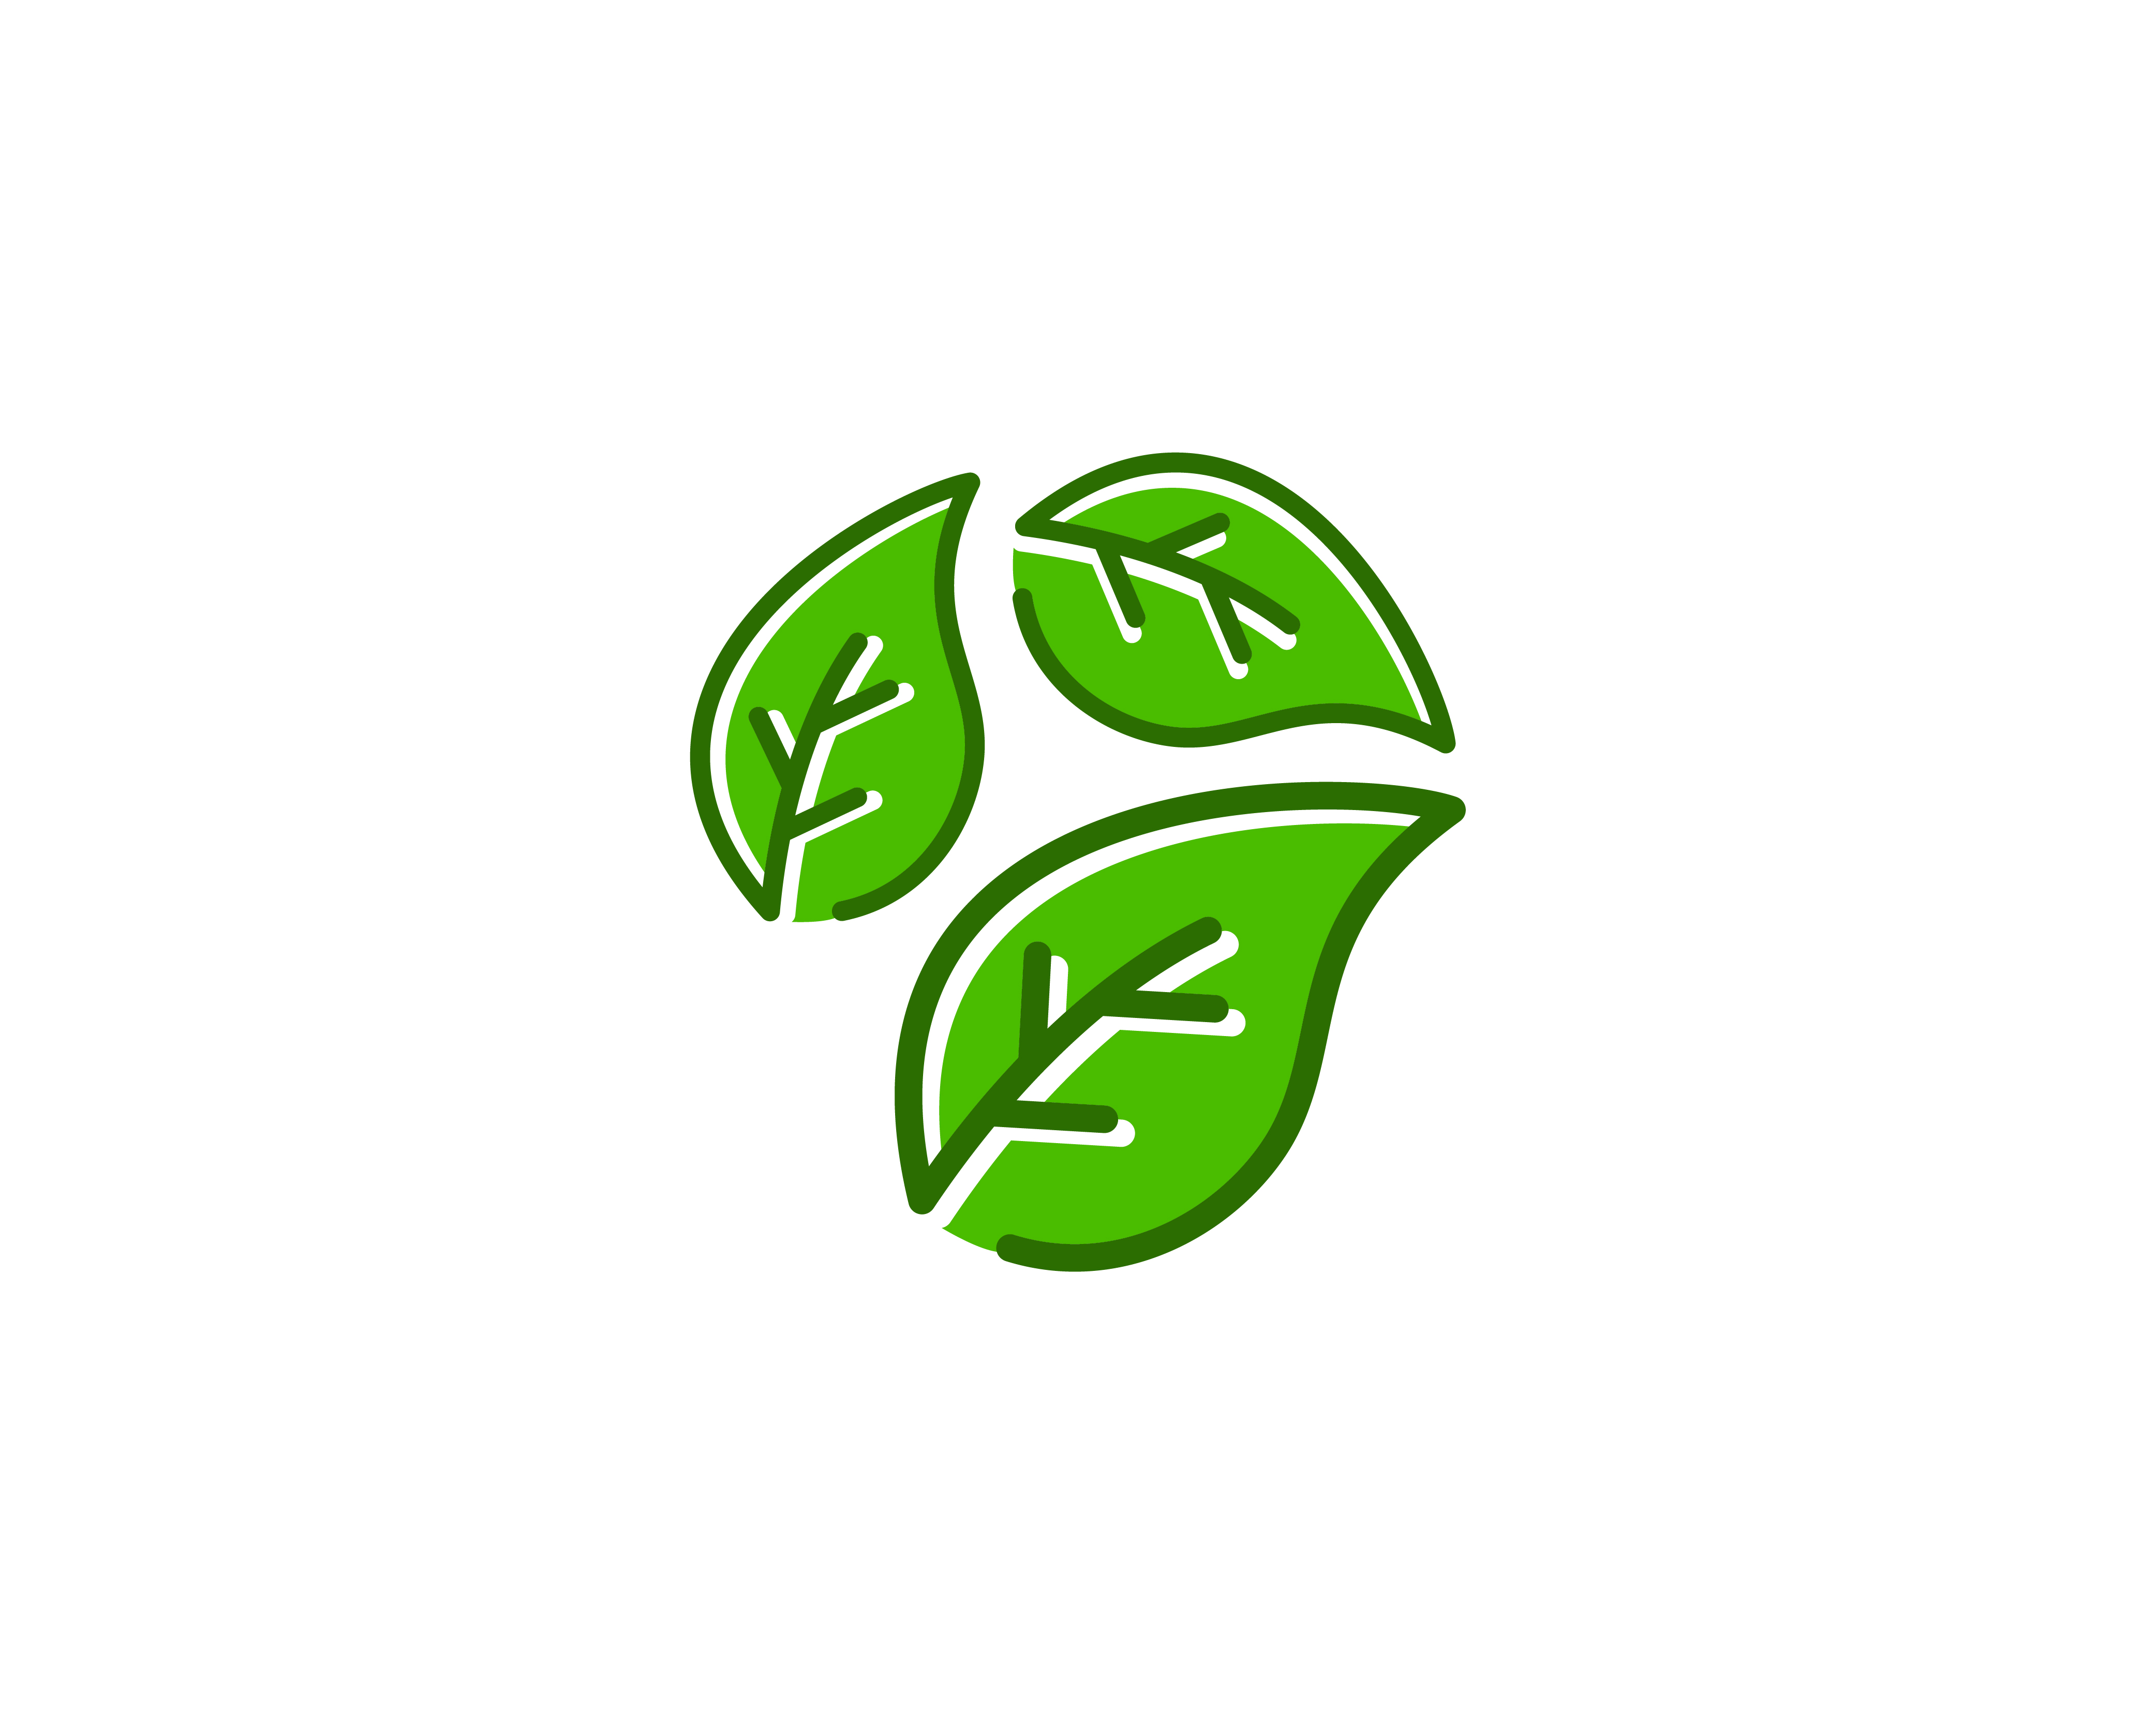 Natural Leaf Logo Icon Vector - Download Free Vectors ...